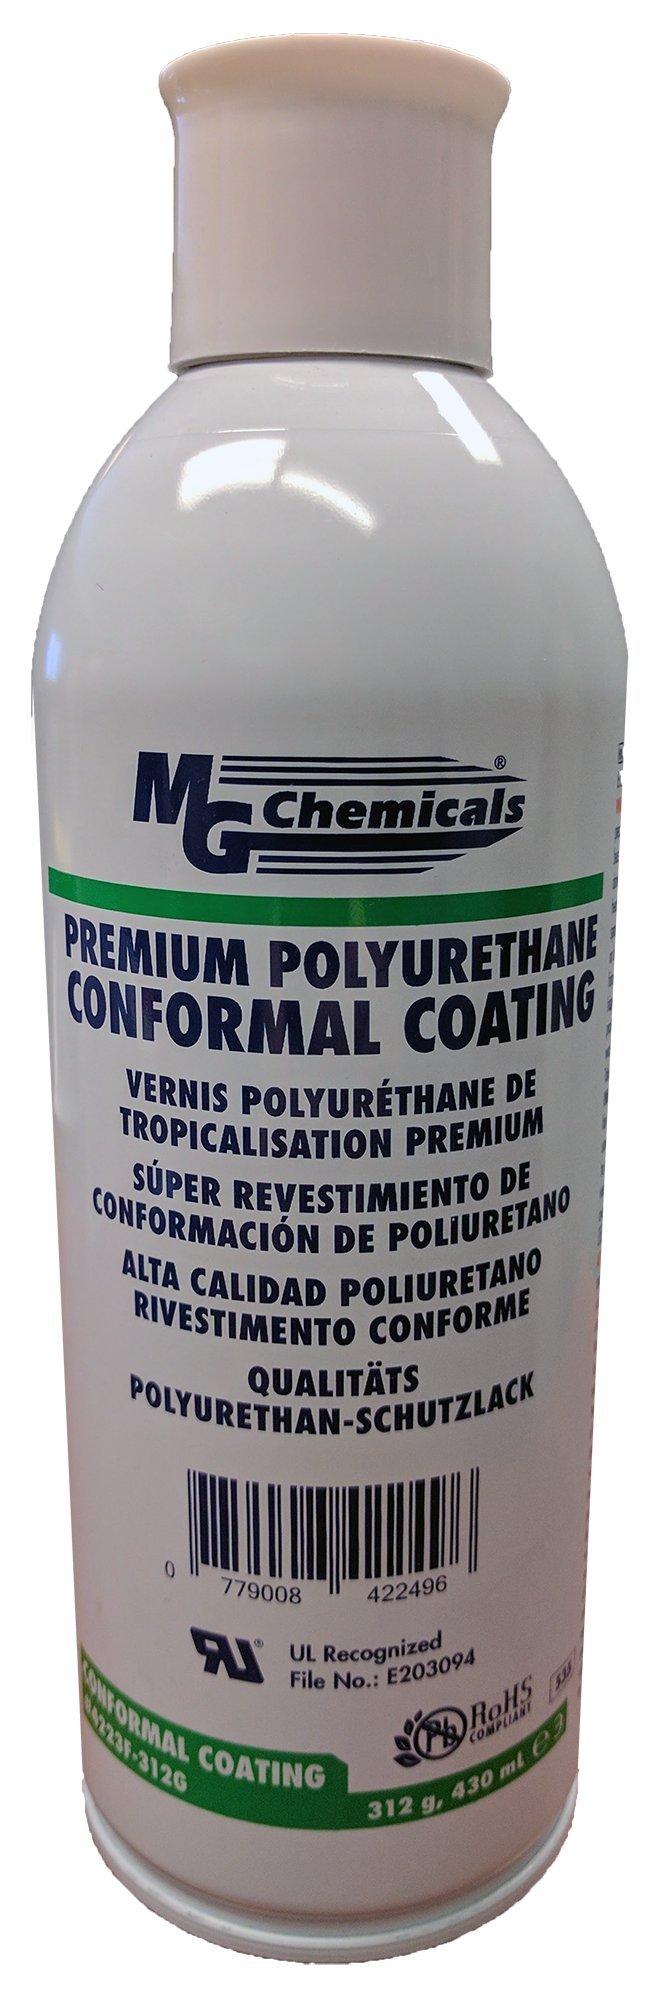 MG Chemicals Premium Polyurethane Conformal Coating, 11 oz, Aerosol